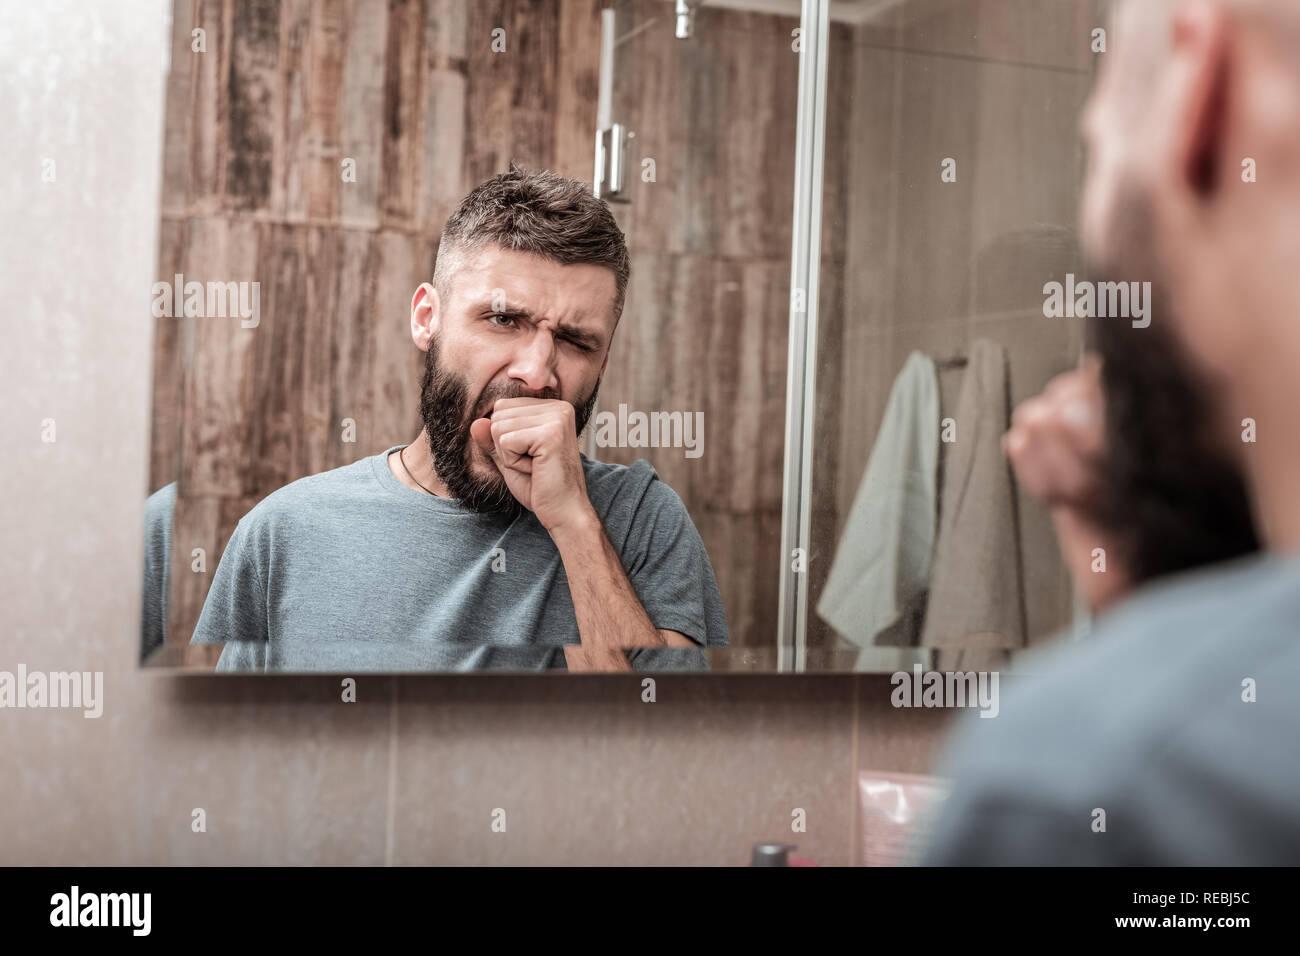 Businessman yawning while feeling sleepy in the morning - Stock Image